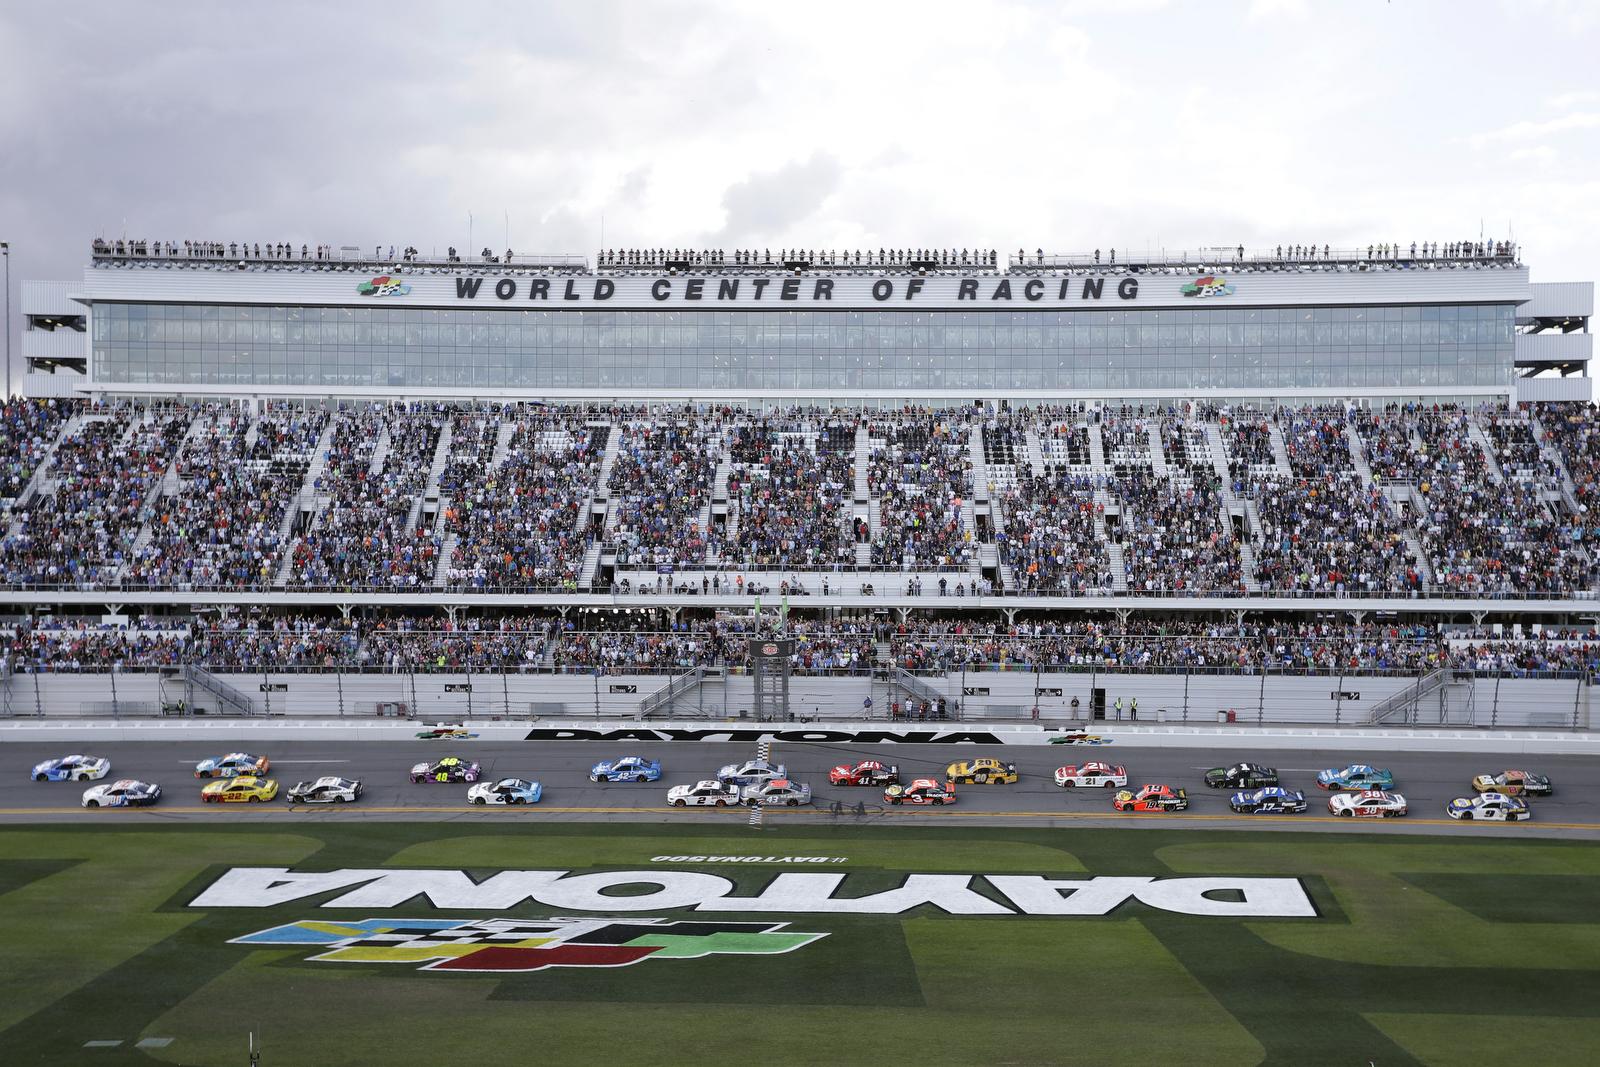 Drivers take the green flag to start NASCAR Daytona 500 auto race Sunday, Feb. 16, 2020, at Daytona International Speedway in Daytona Beach, Fla. AP